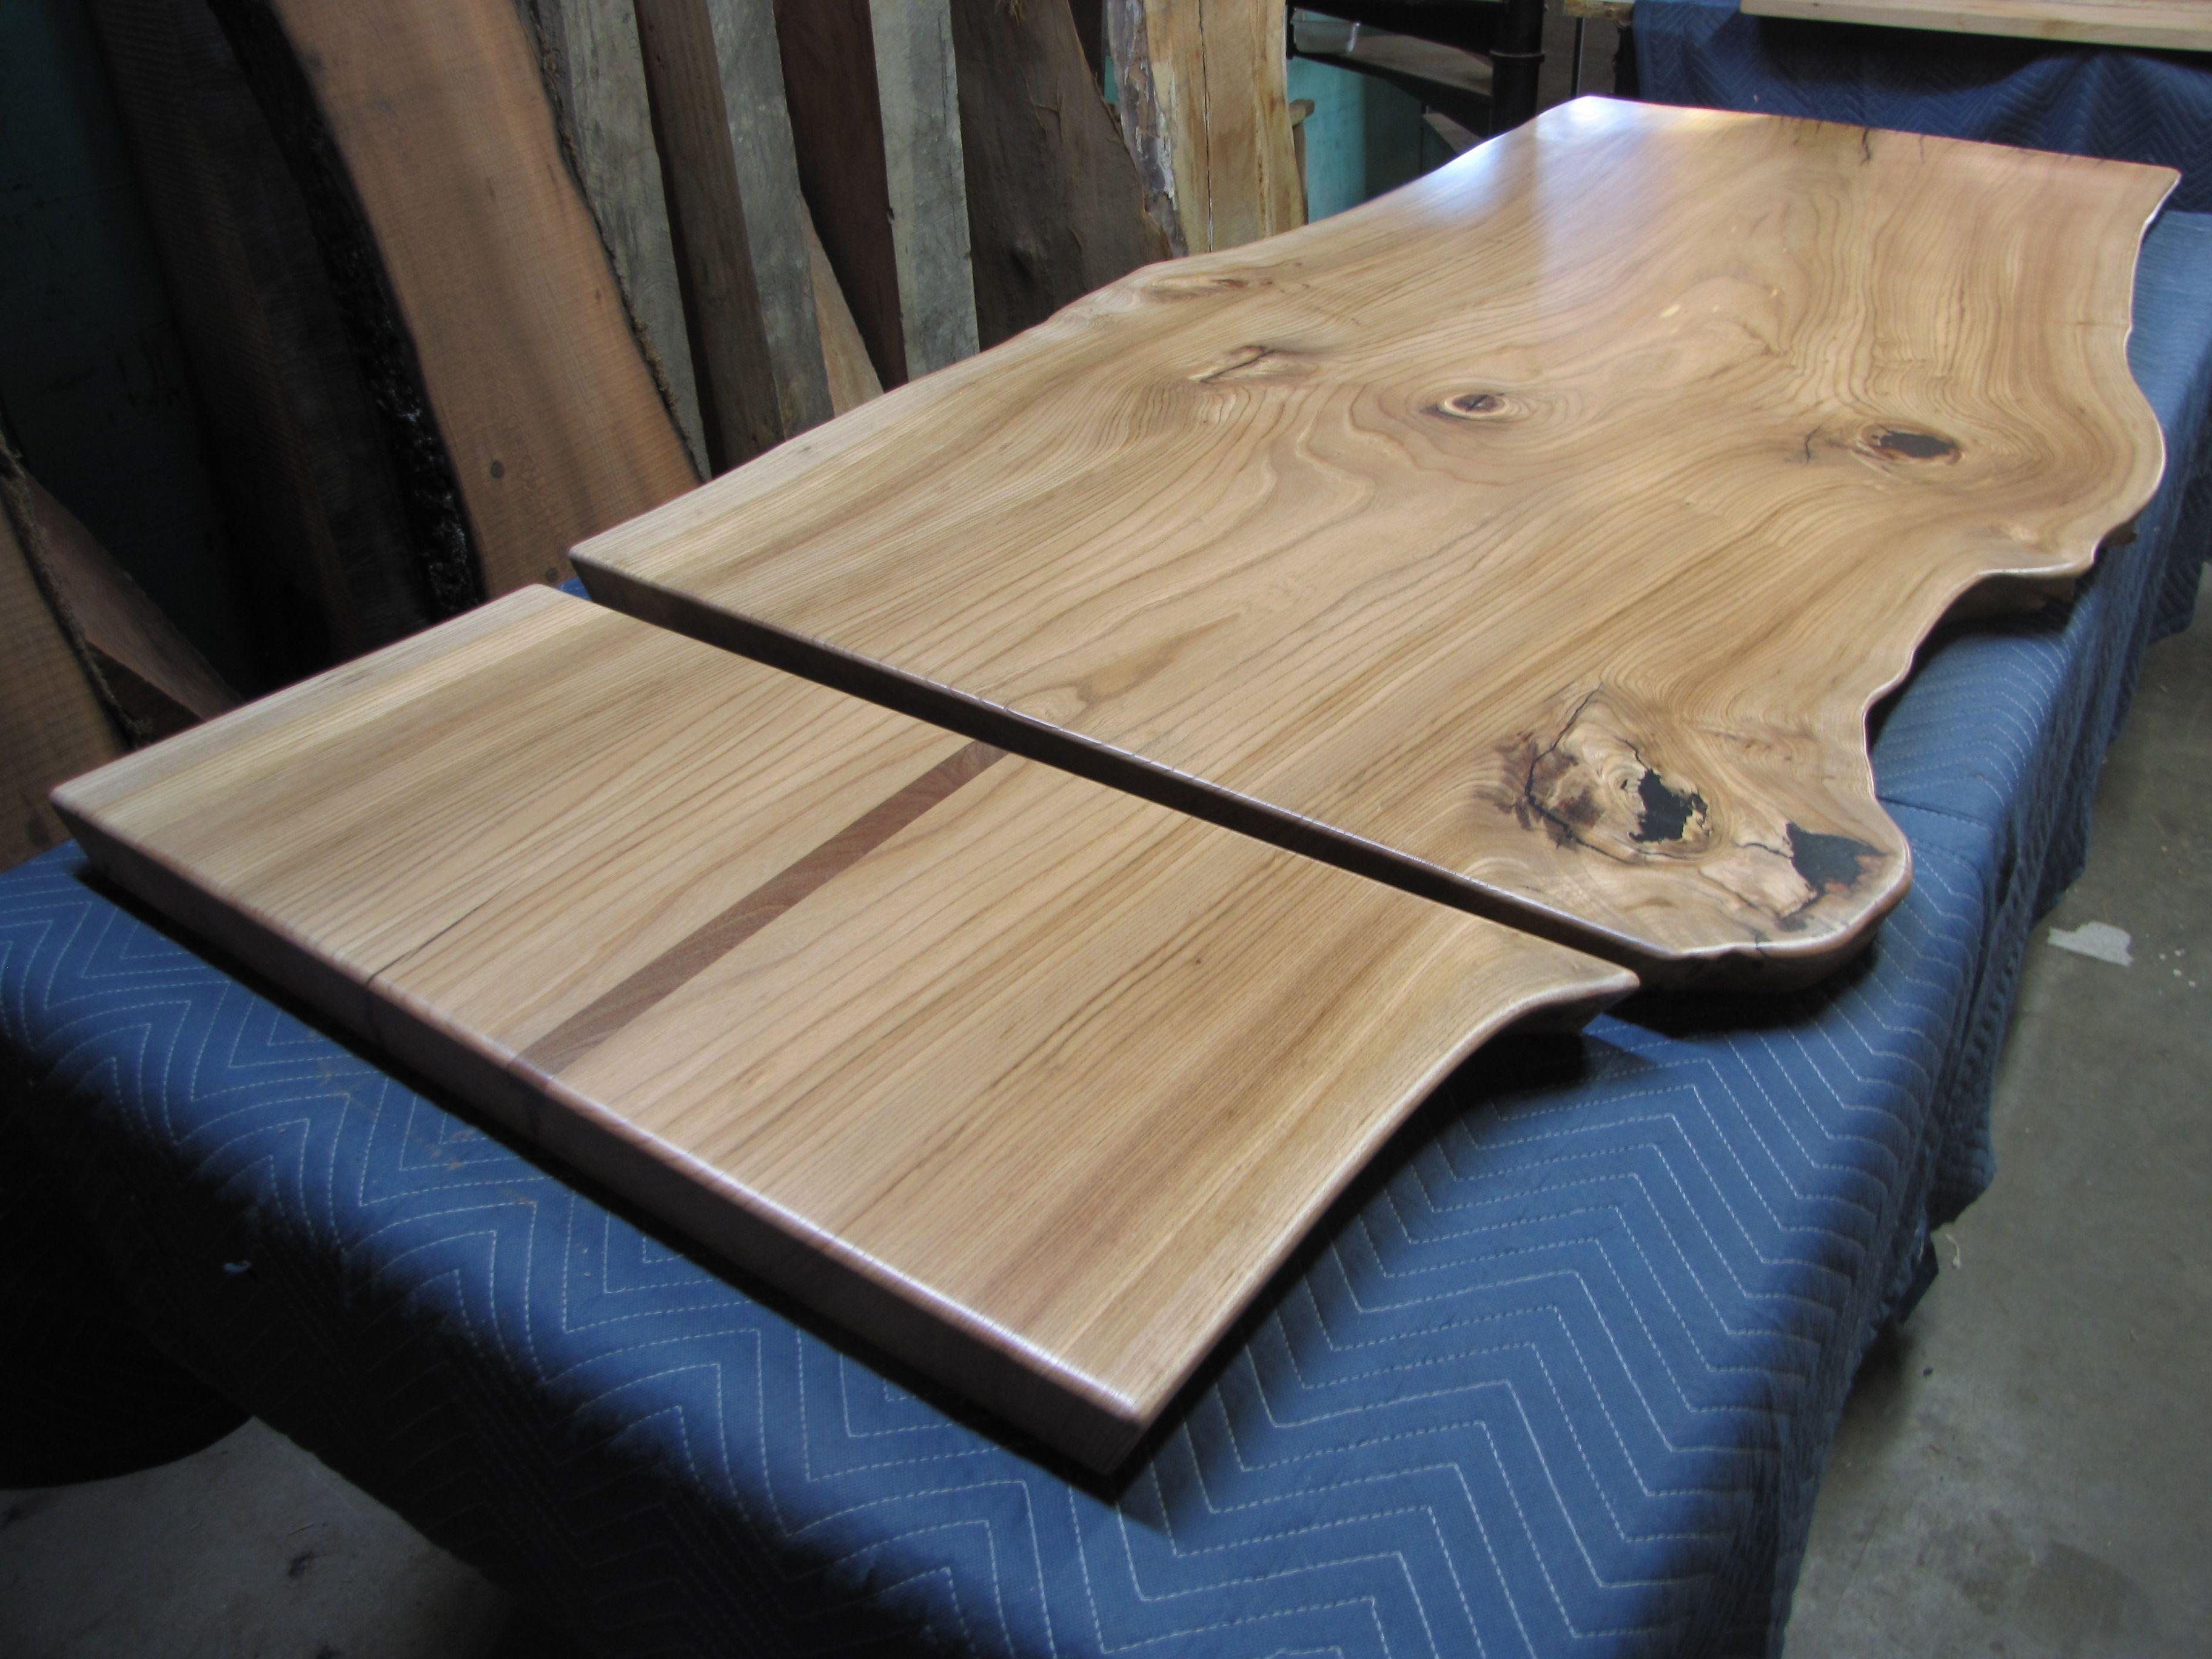 Reclaimed Wood Slab Table - Elm slab table top and bench top with teak stripe spline